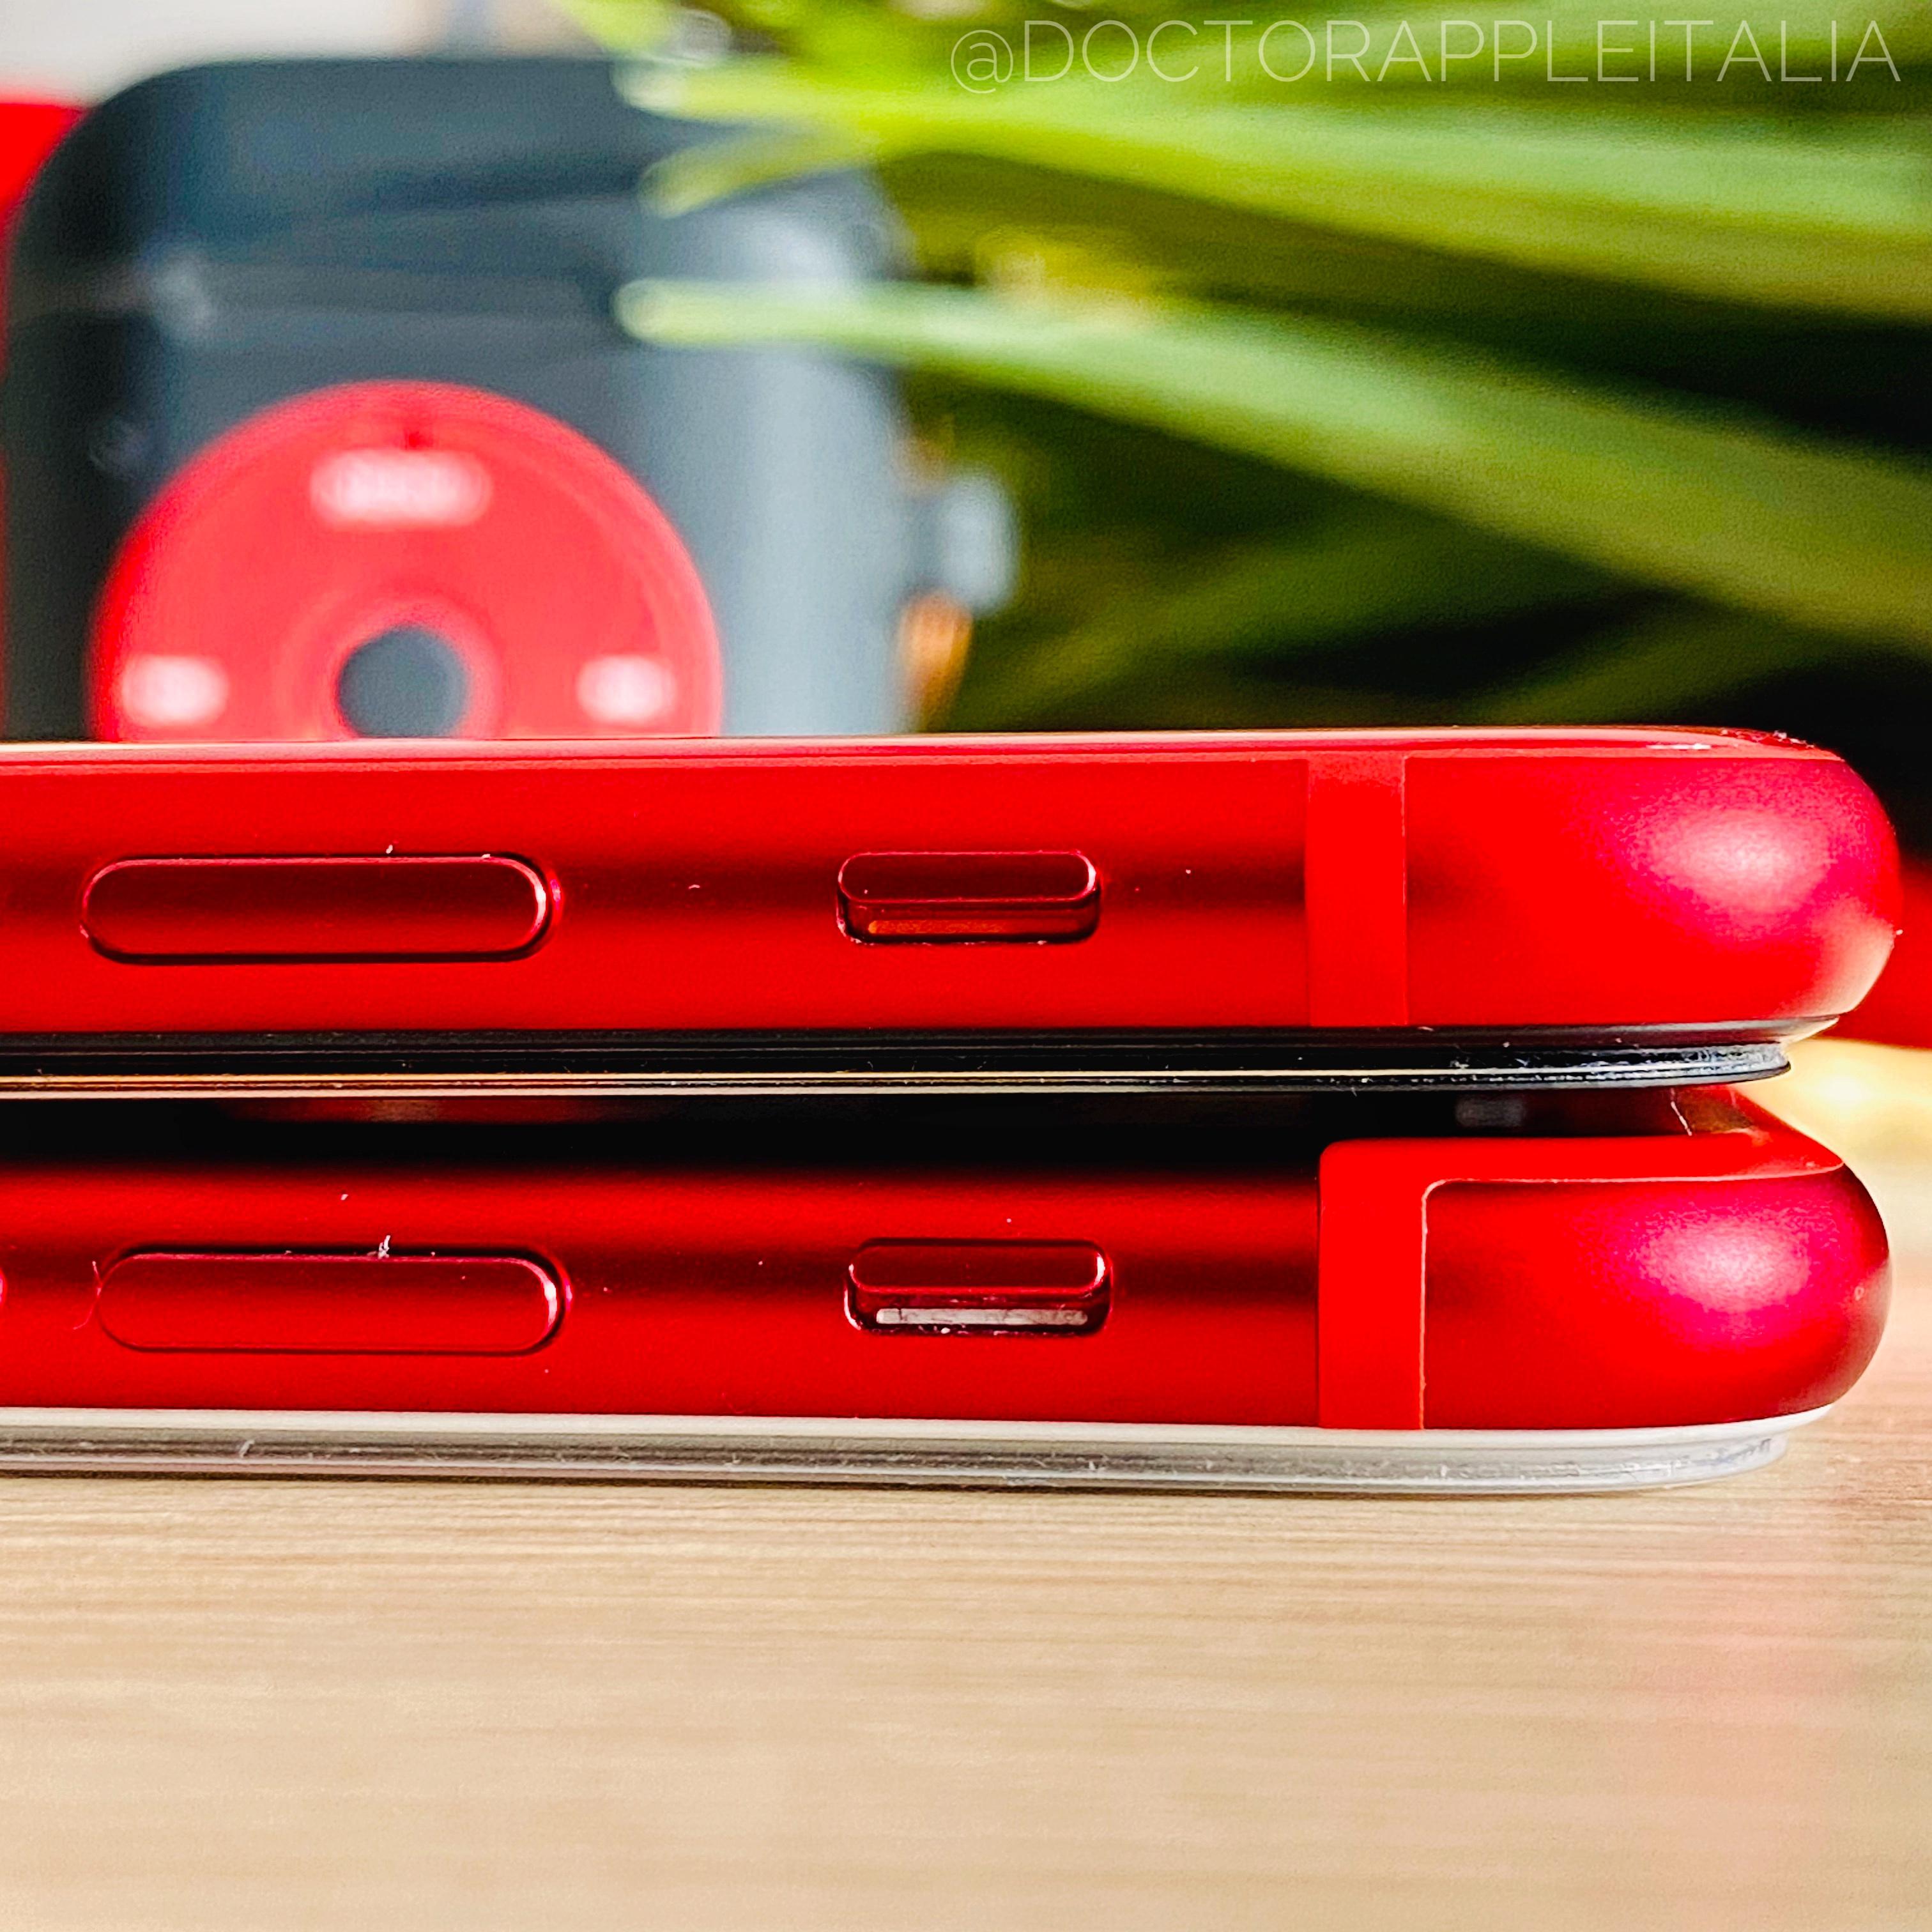 iphone7-8_cavo_ceotech_doctorapple_4